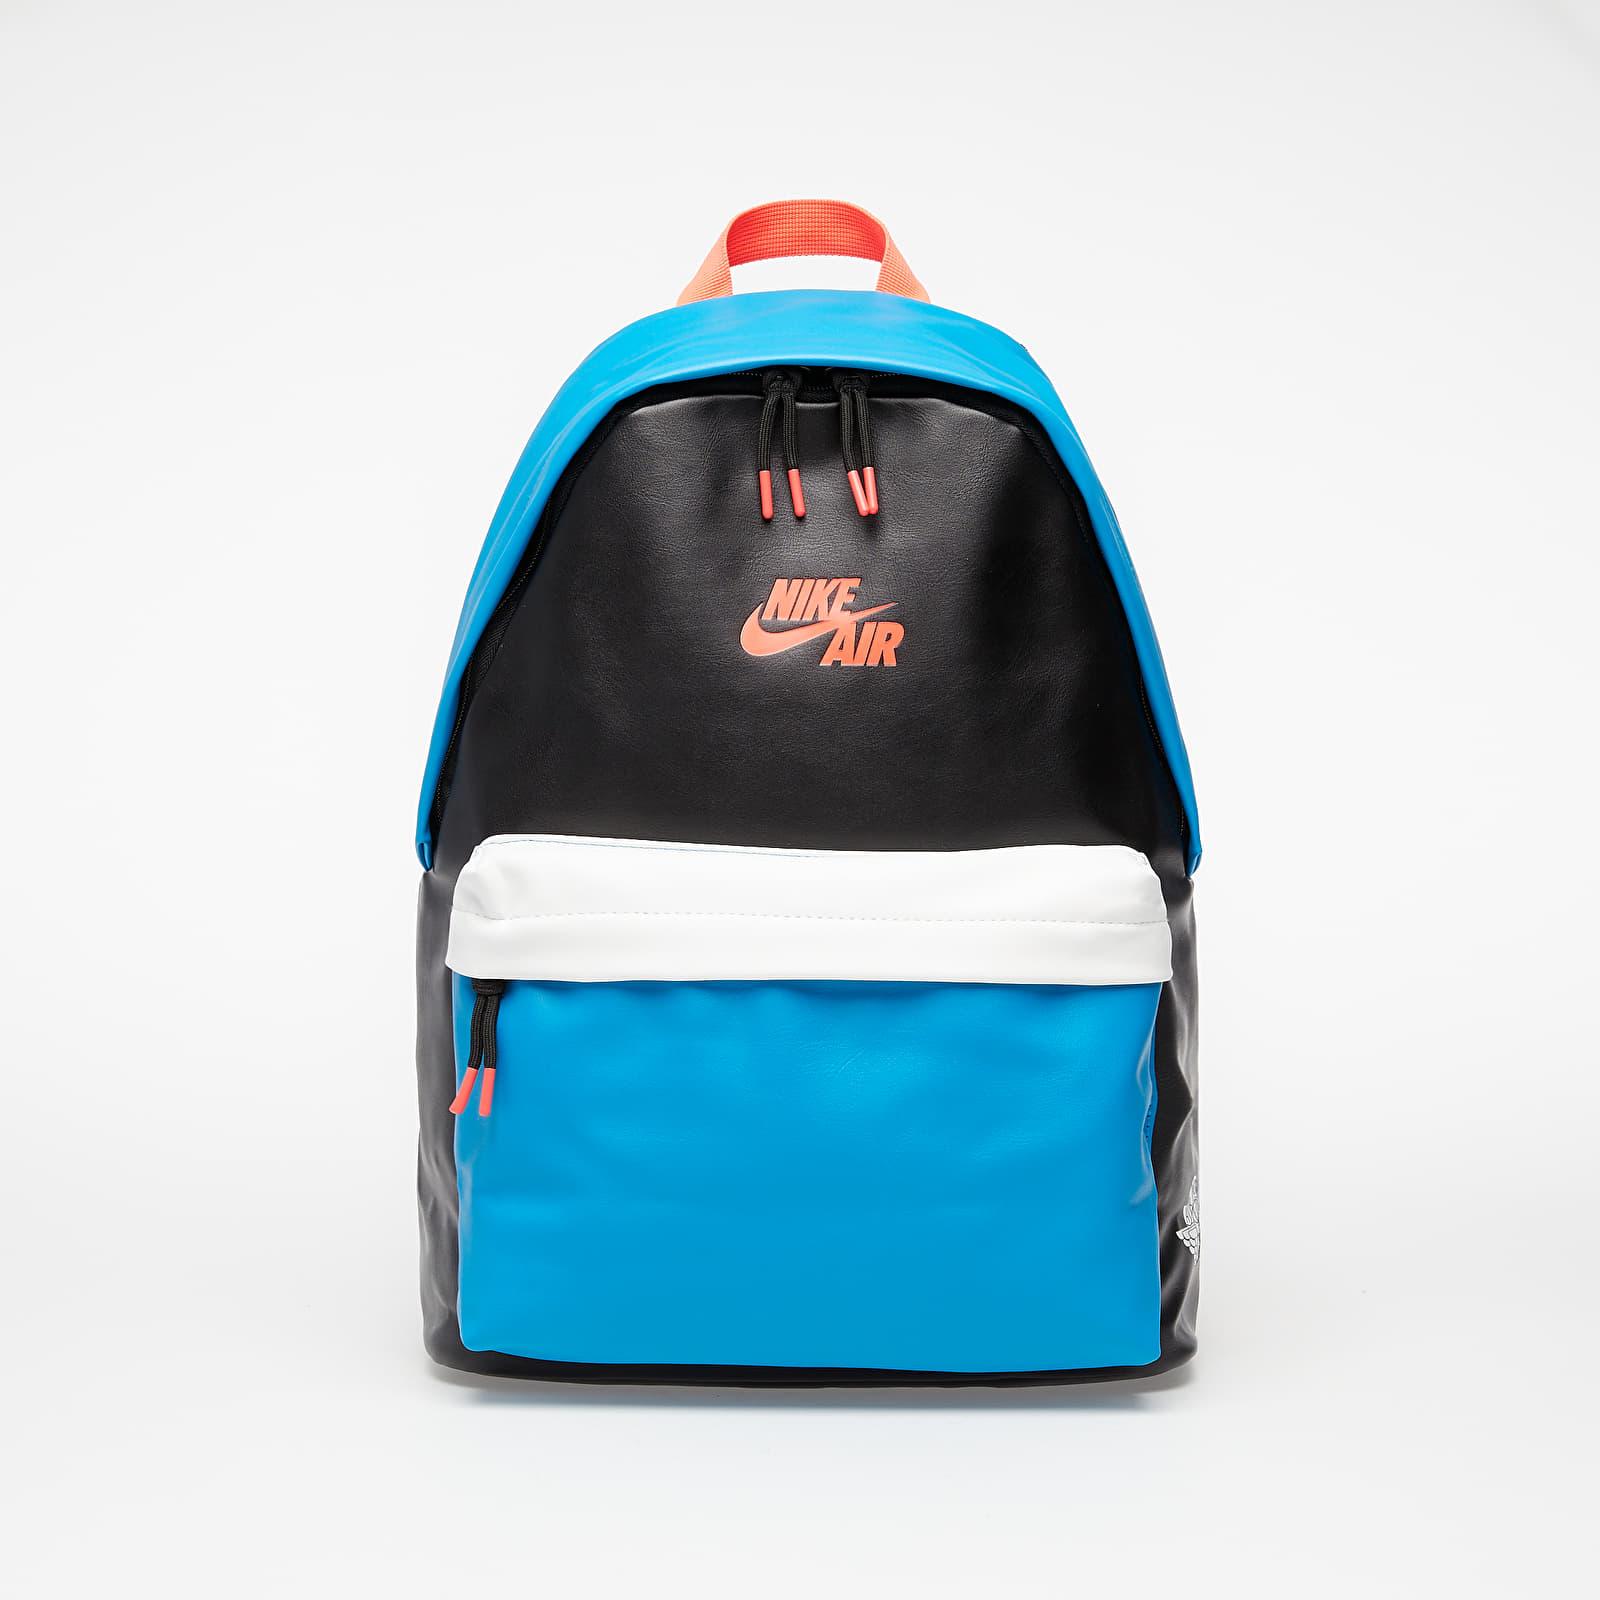 Jordan Air 1 Backpack Black/ Blue/ White/ Neon Pink EUR L